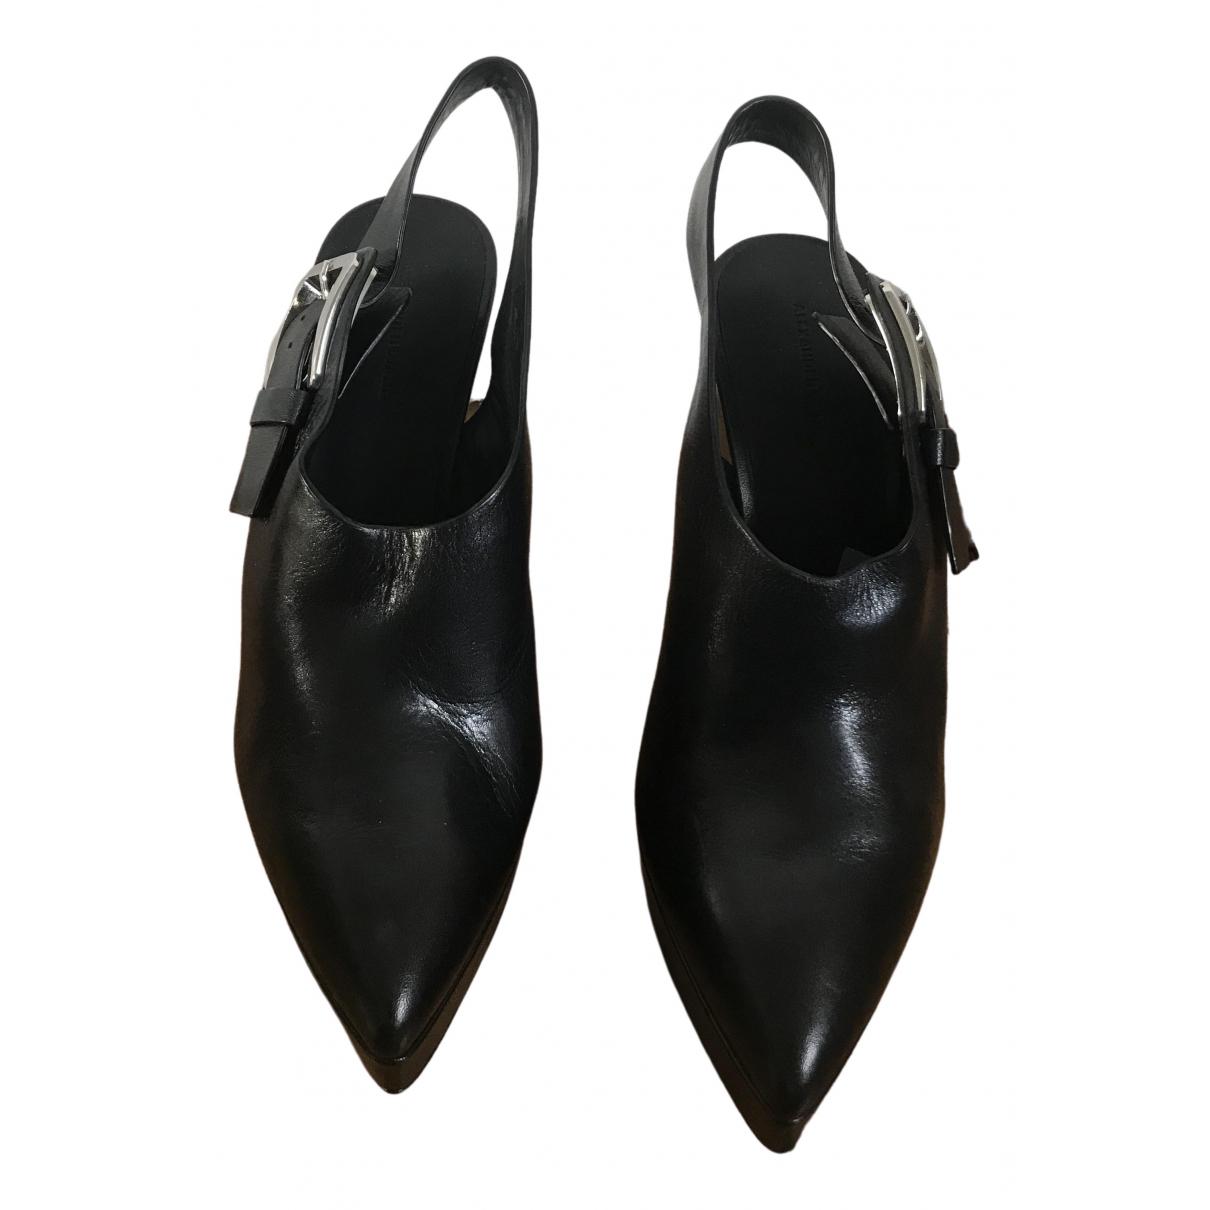 Alexander Wang \N Black Leather Mules & Clogs for Women 40 EU